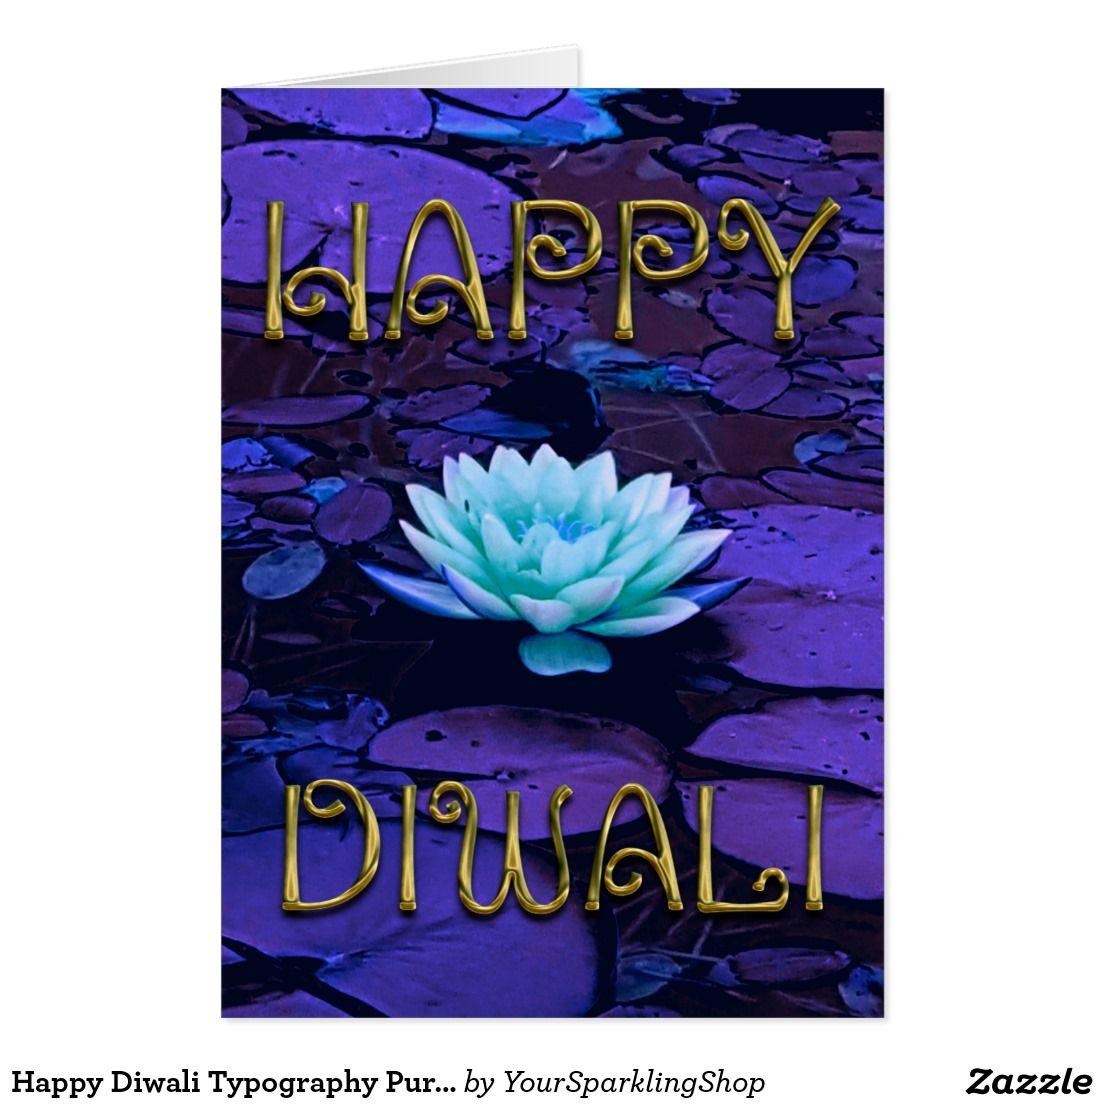 Happy Diwali Typography Purple Floral Lotus Flower Card Zazzle Com Flower Cards Happy Diwali Diwali